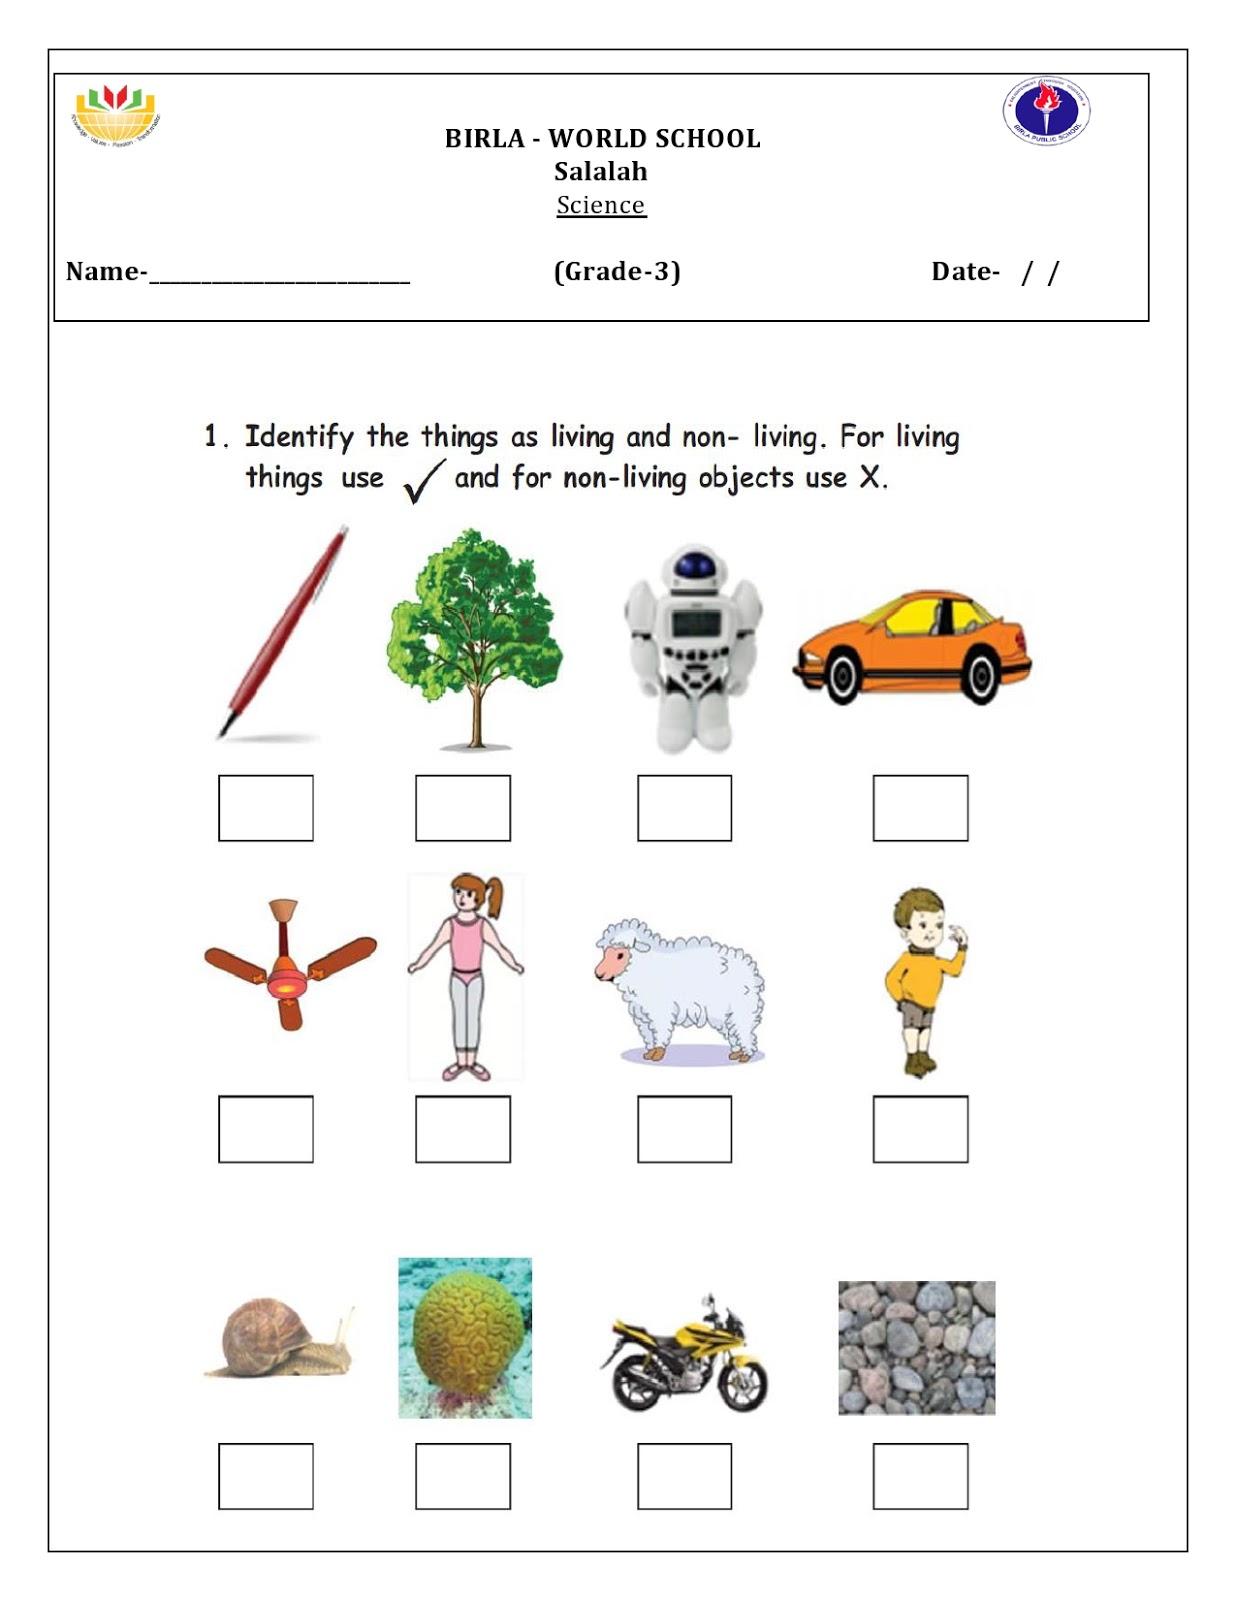 Birla World School Oman Homework For Grade 3b On 26 05 16